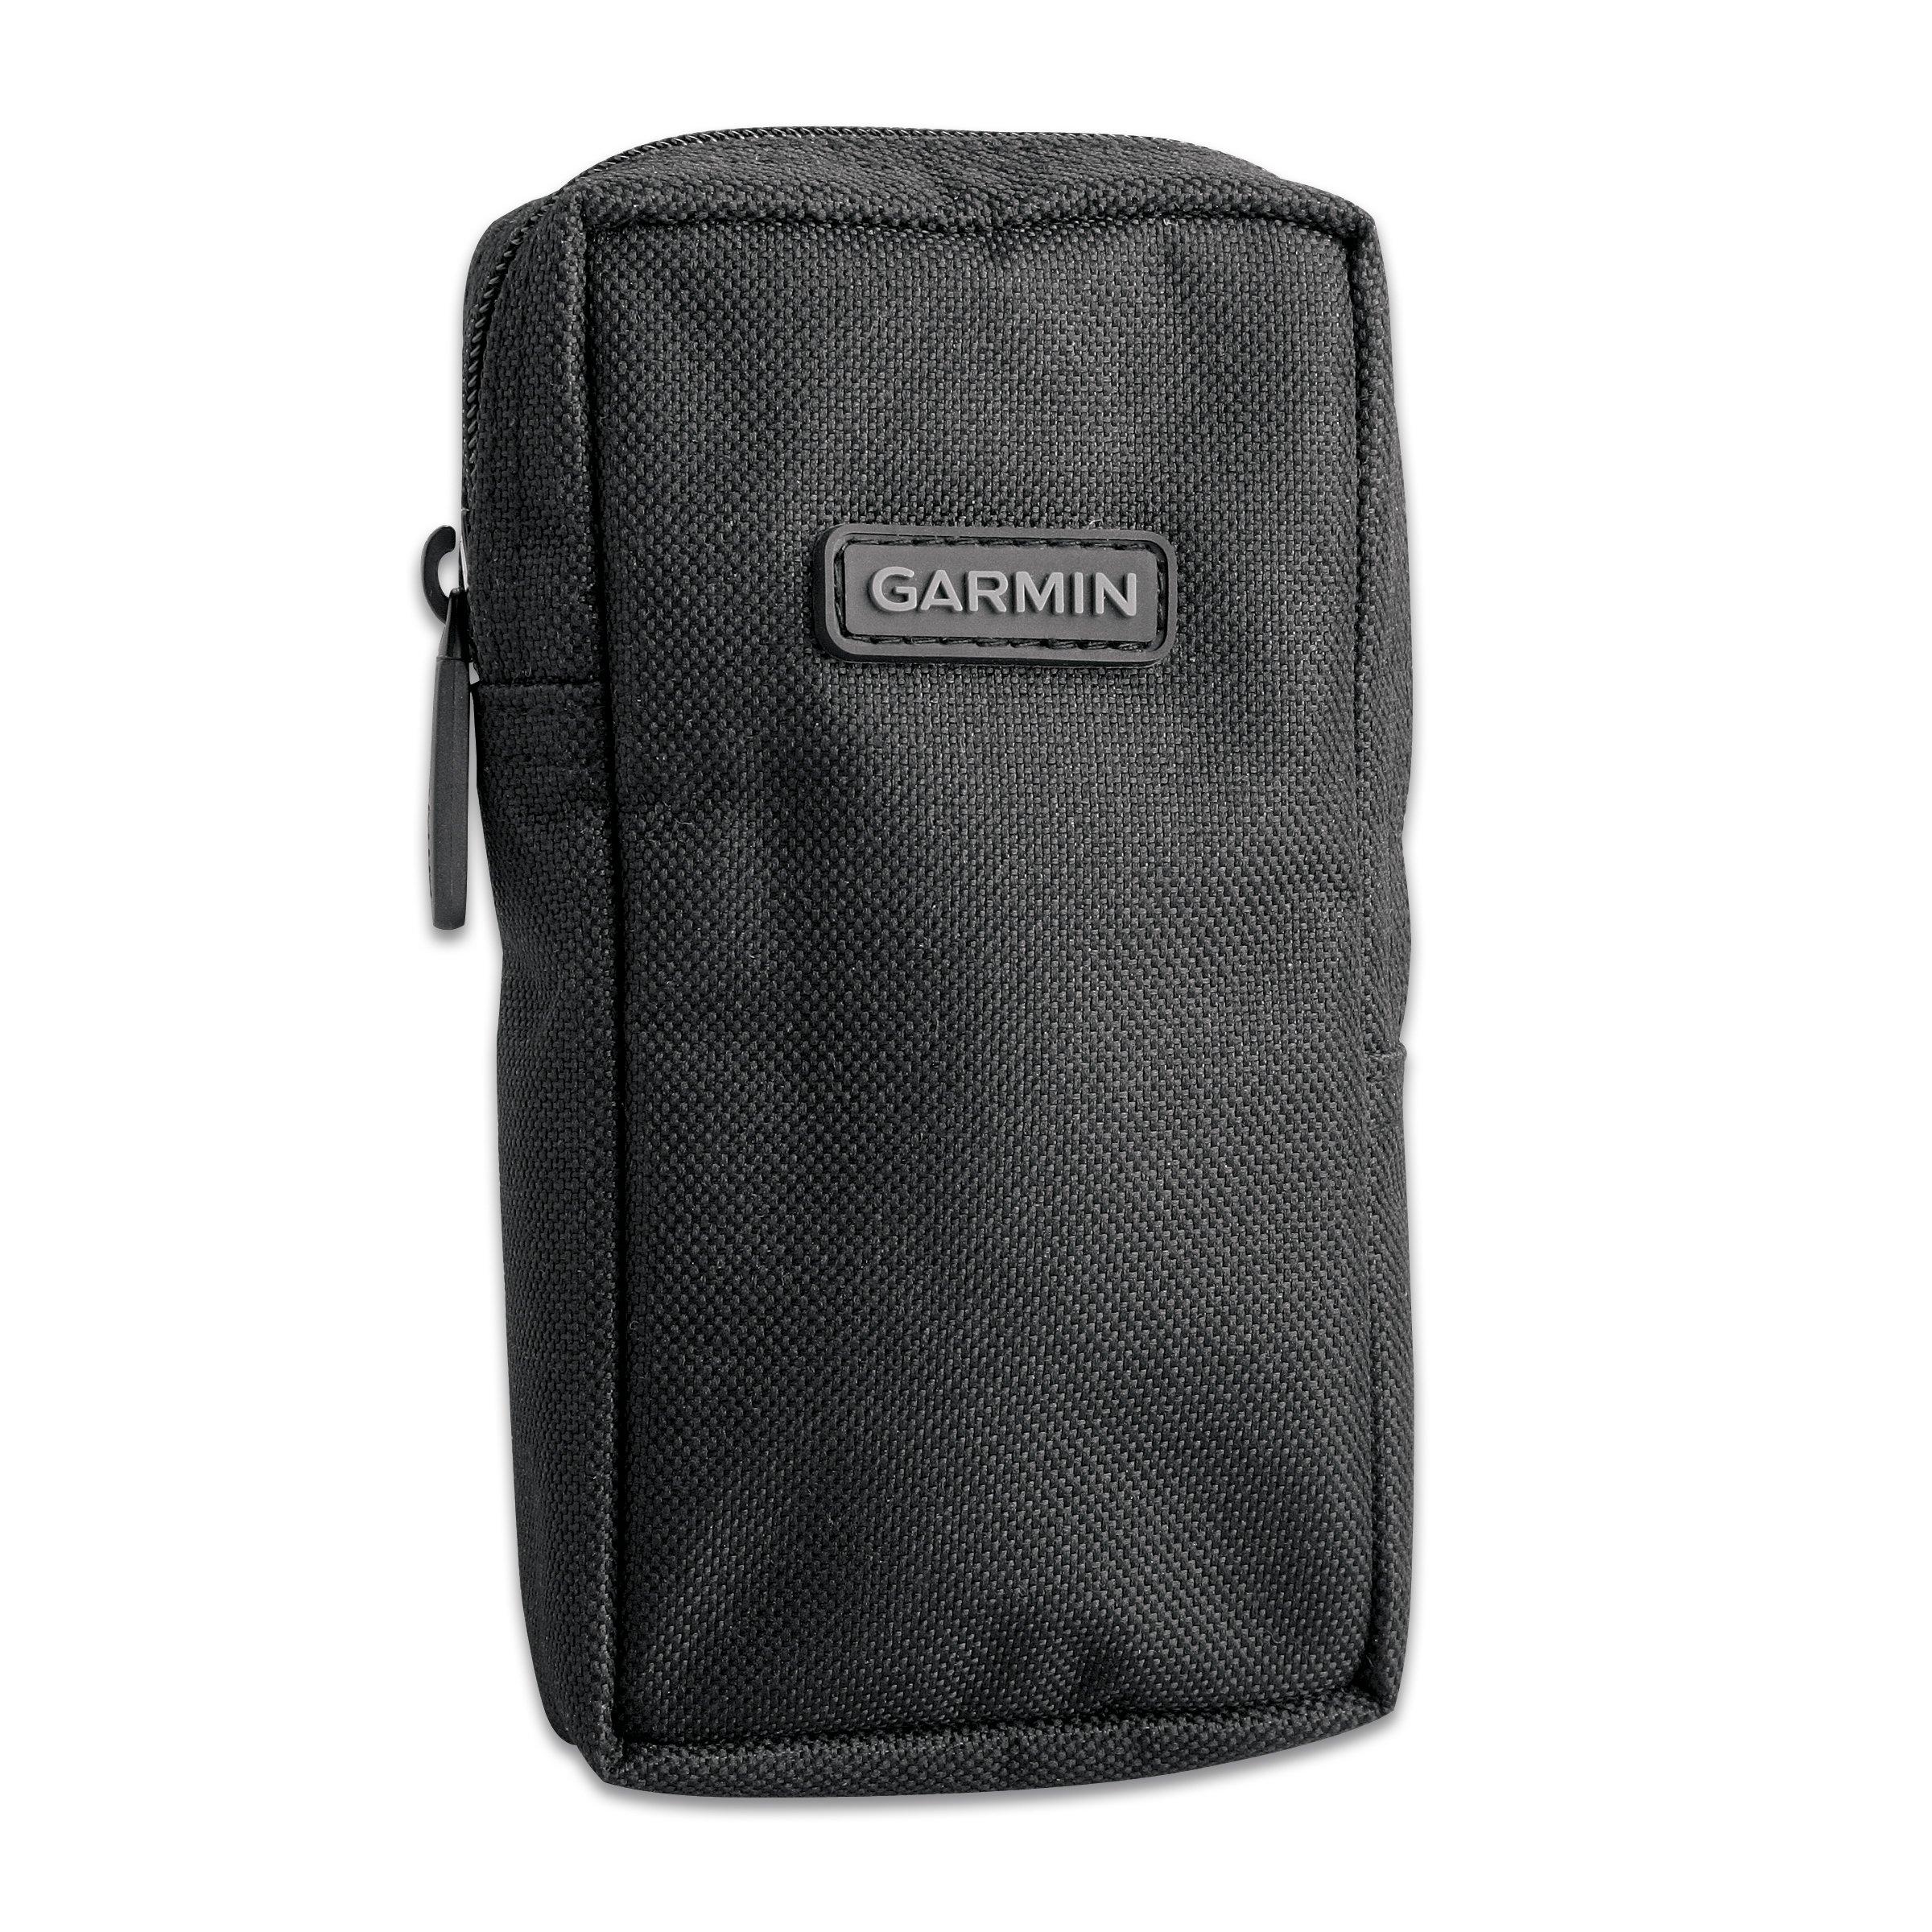 Garmin Universal Carrying Case 010-10117-02 by Garmin